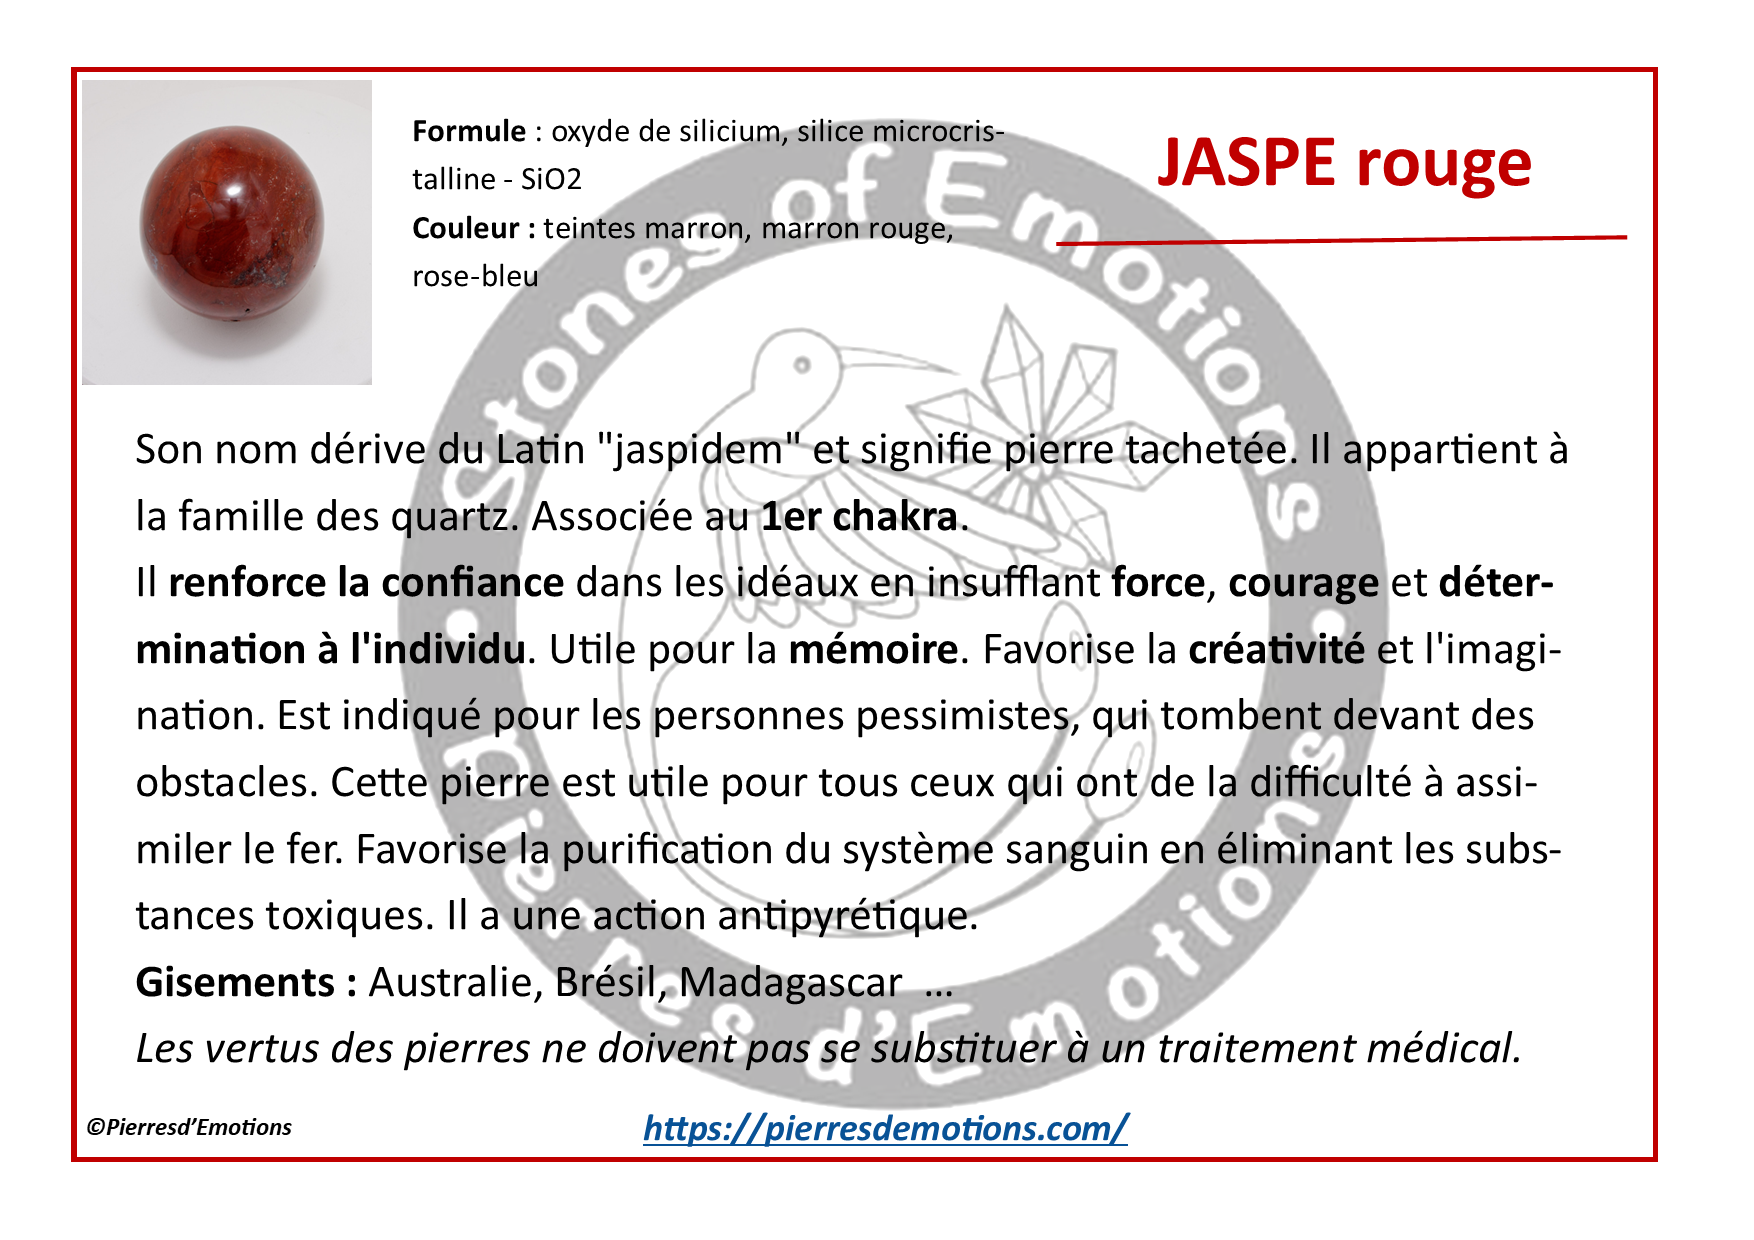 JaspeRouge